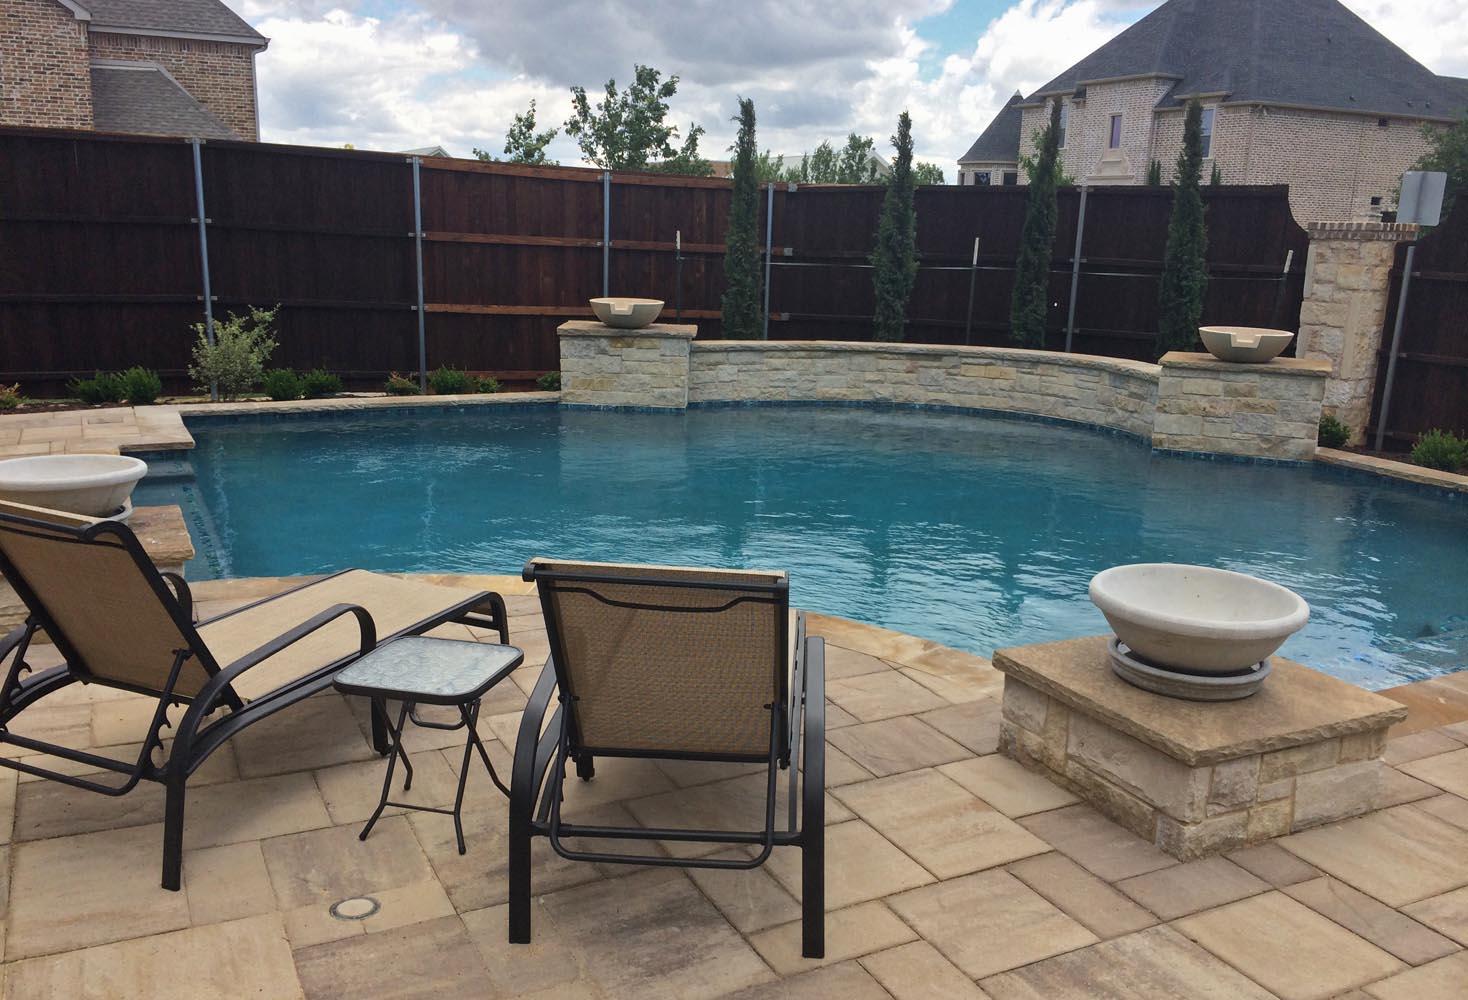 Dallas geometric pool design gallery frisco plano pool for Pool design gallery